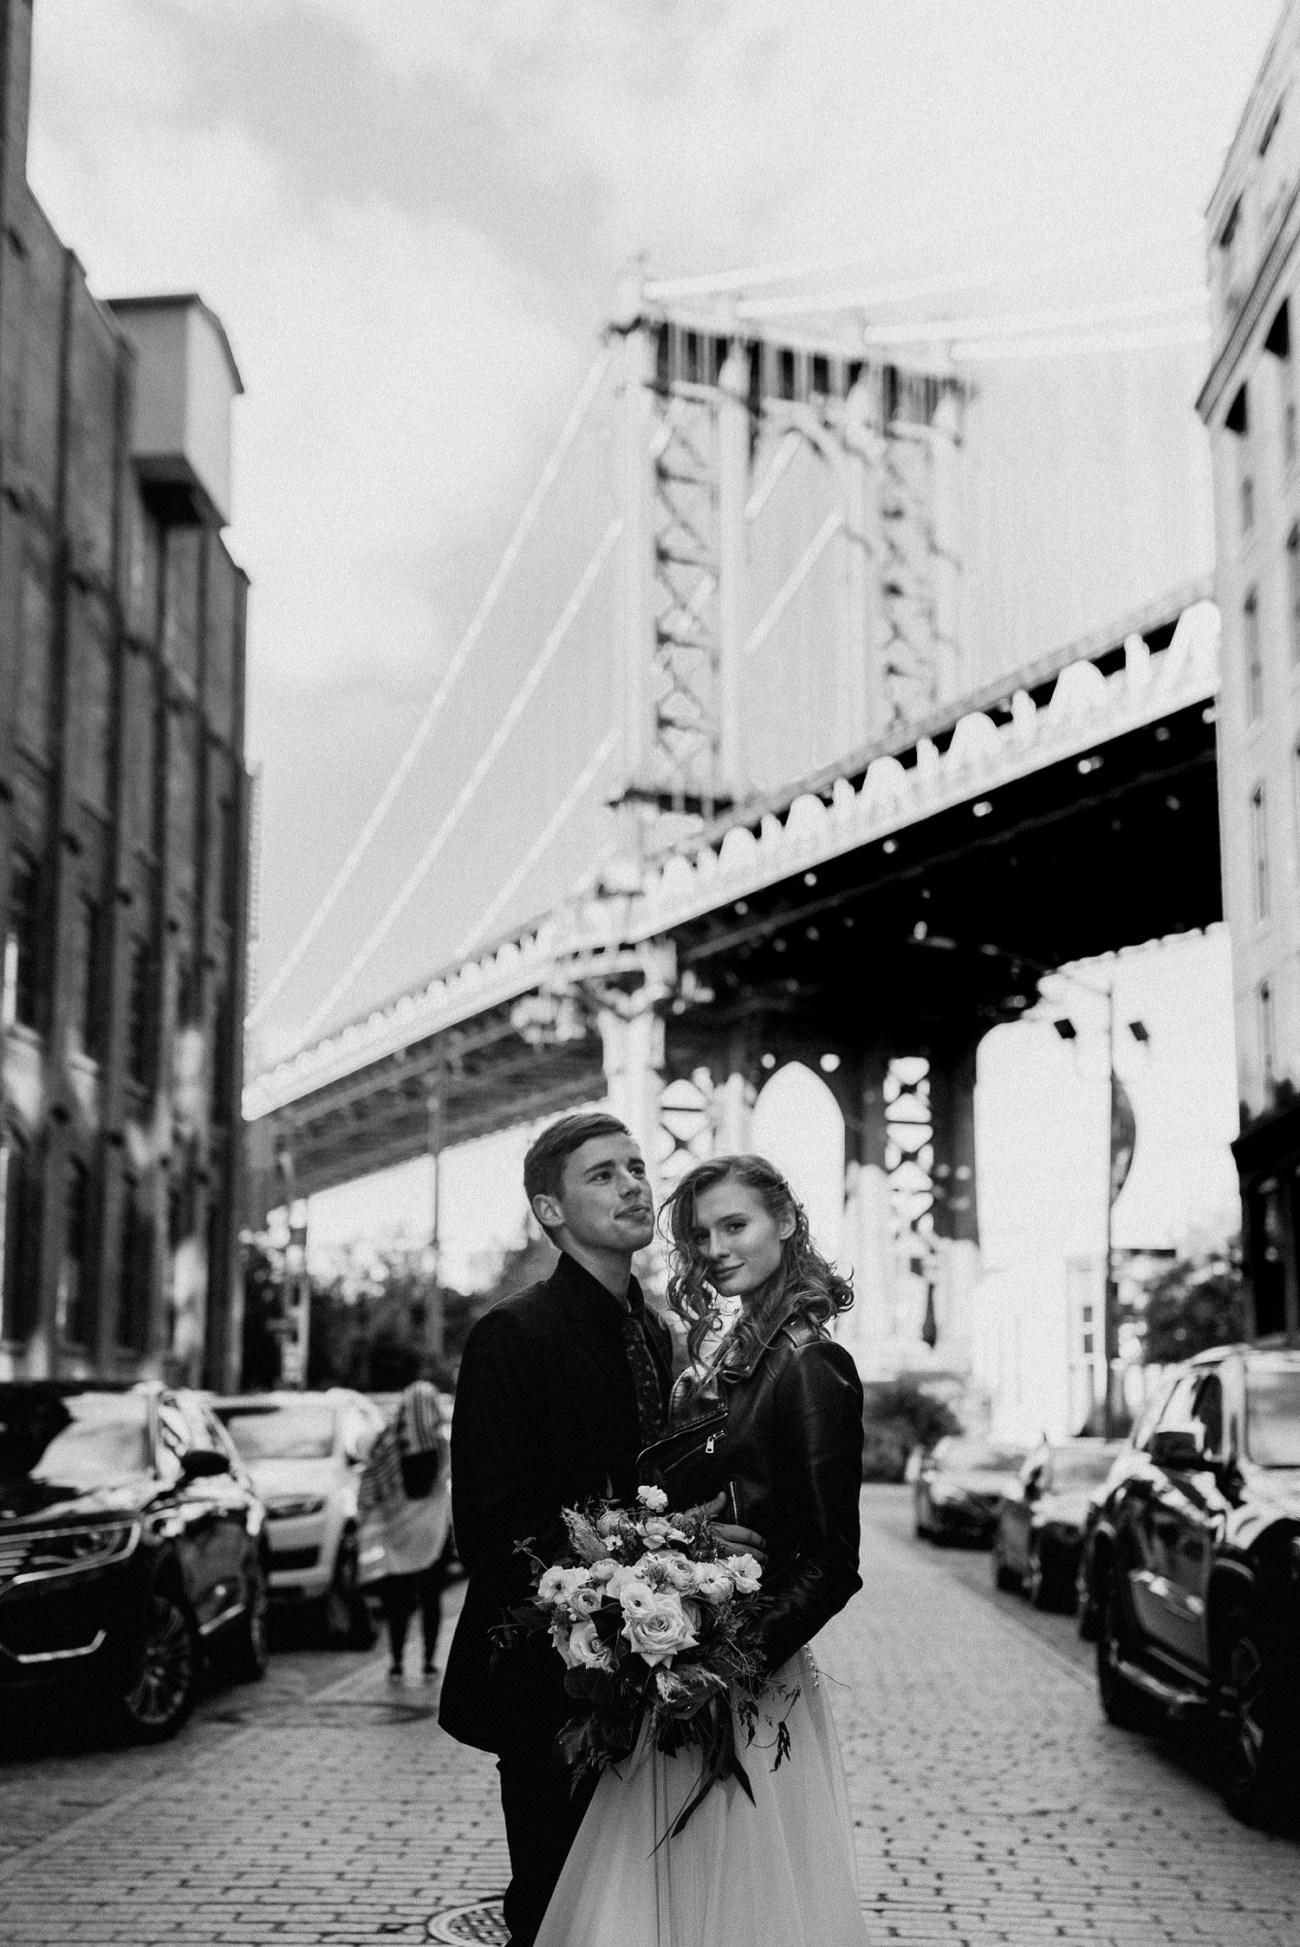 Dumbo Brooklyn wedding photos. Dumbo Brooklyn Bride and Groom elopement photos. Anais Possamai Photography. New York Wedding Photographer. NYC elopement Photographer